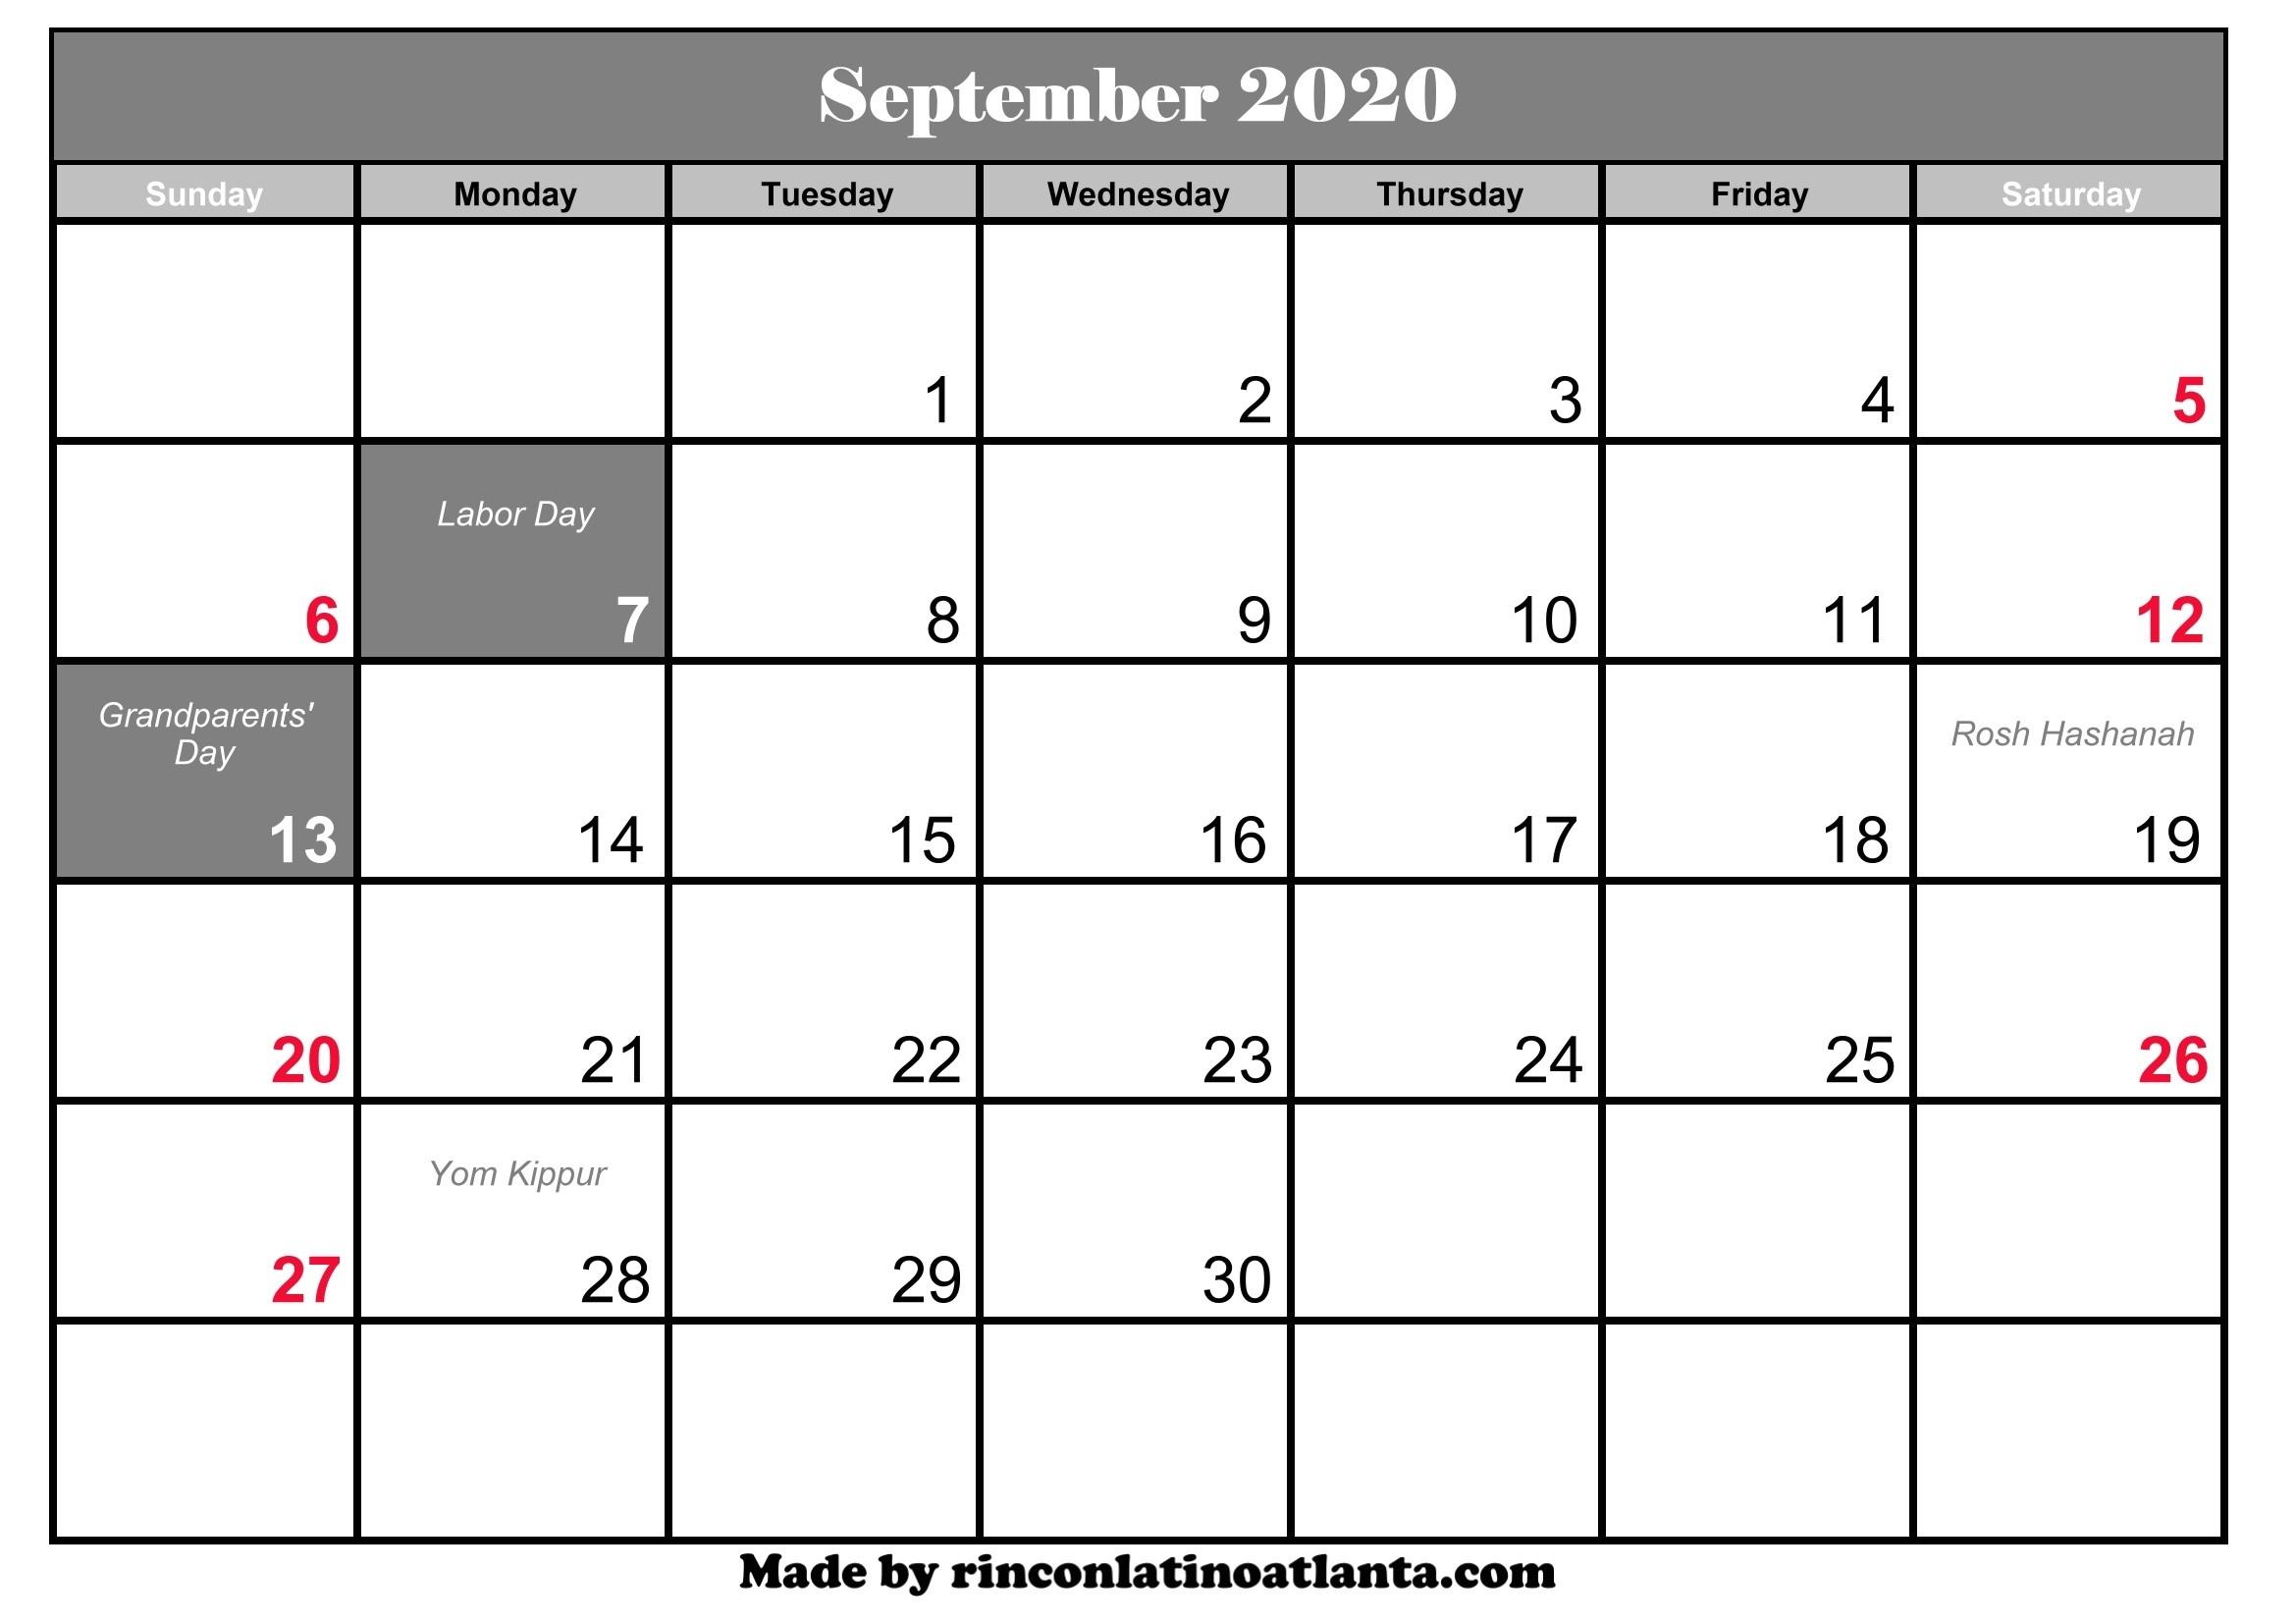 September 2020 Calendar With Holidays | Calendar Template  Printable Full Size Septmeber 2020 Calendar